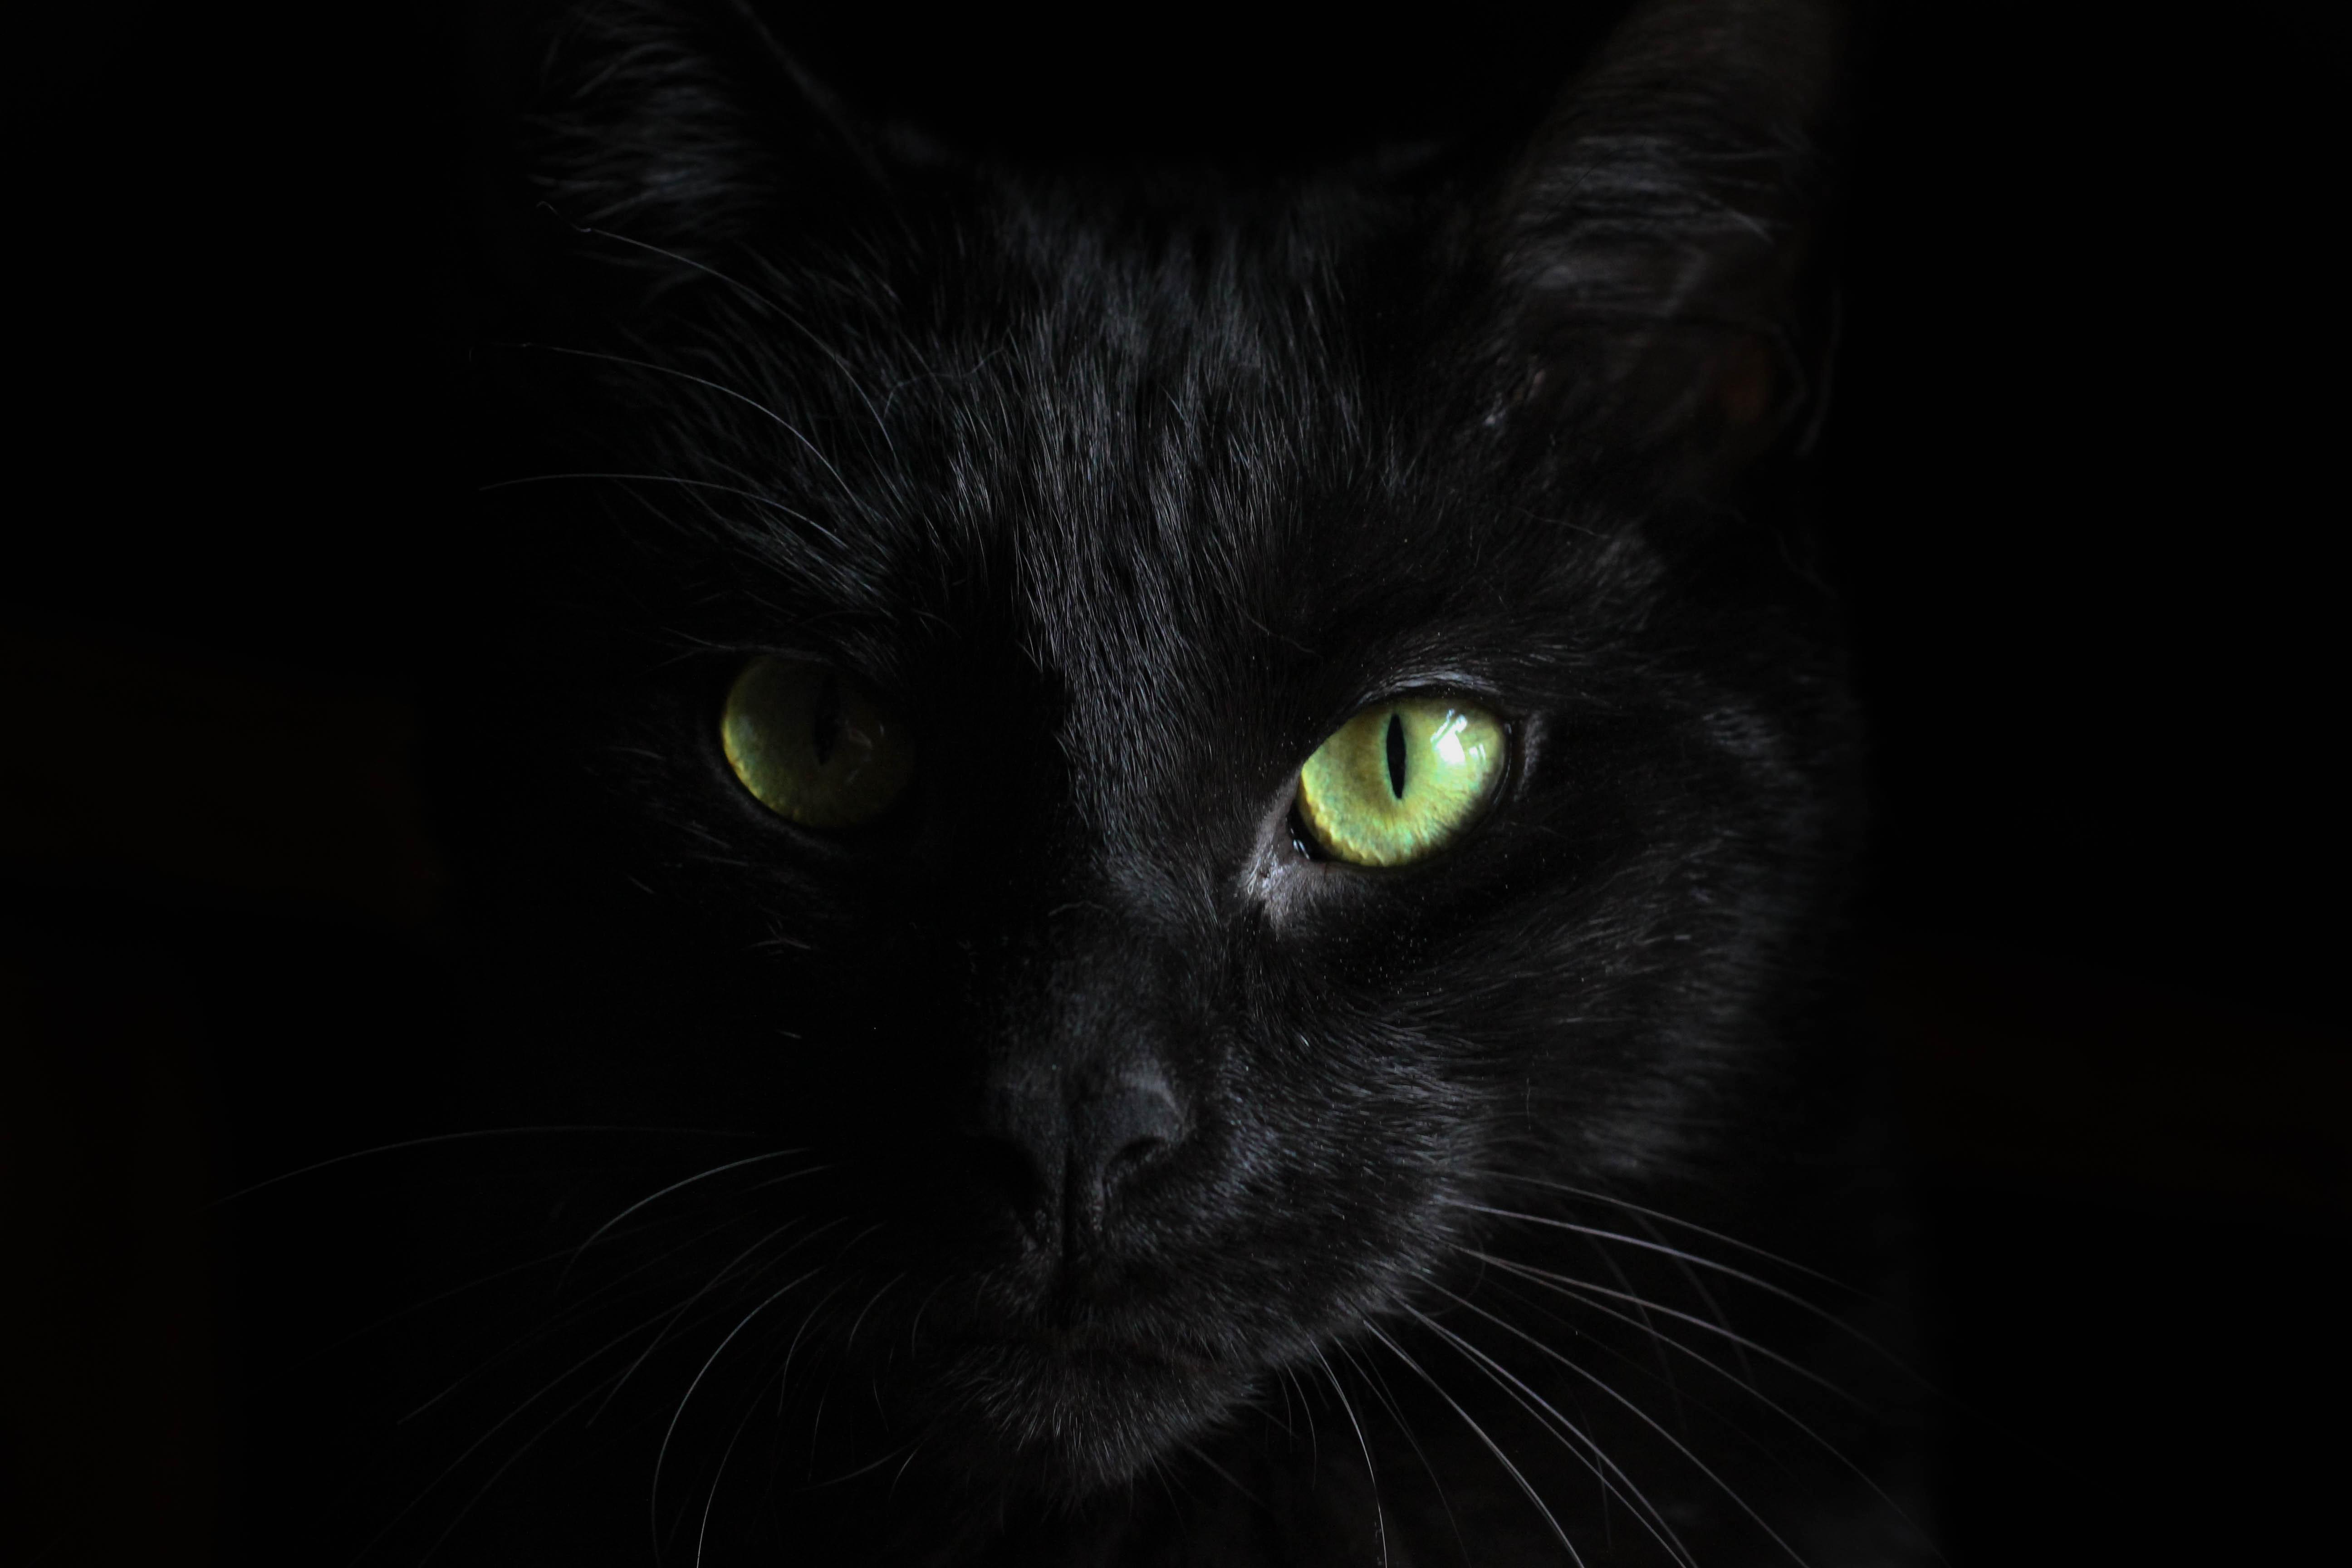 100+ Black Cat Pictures | Download Free Images on Unsplash